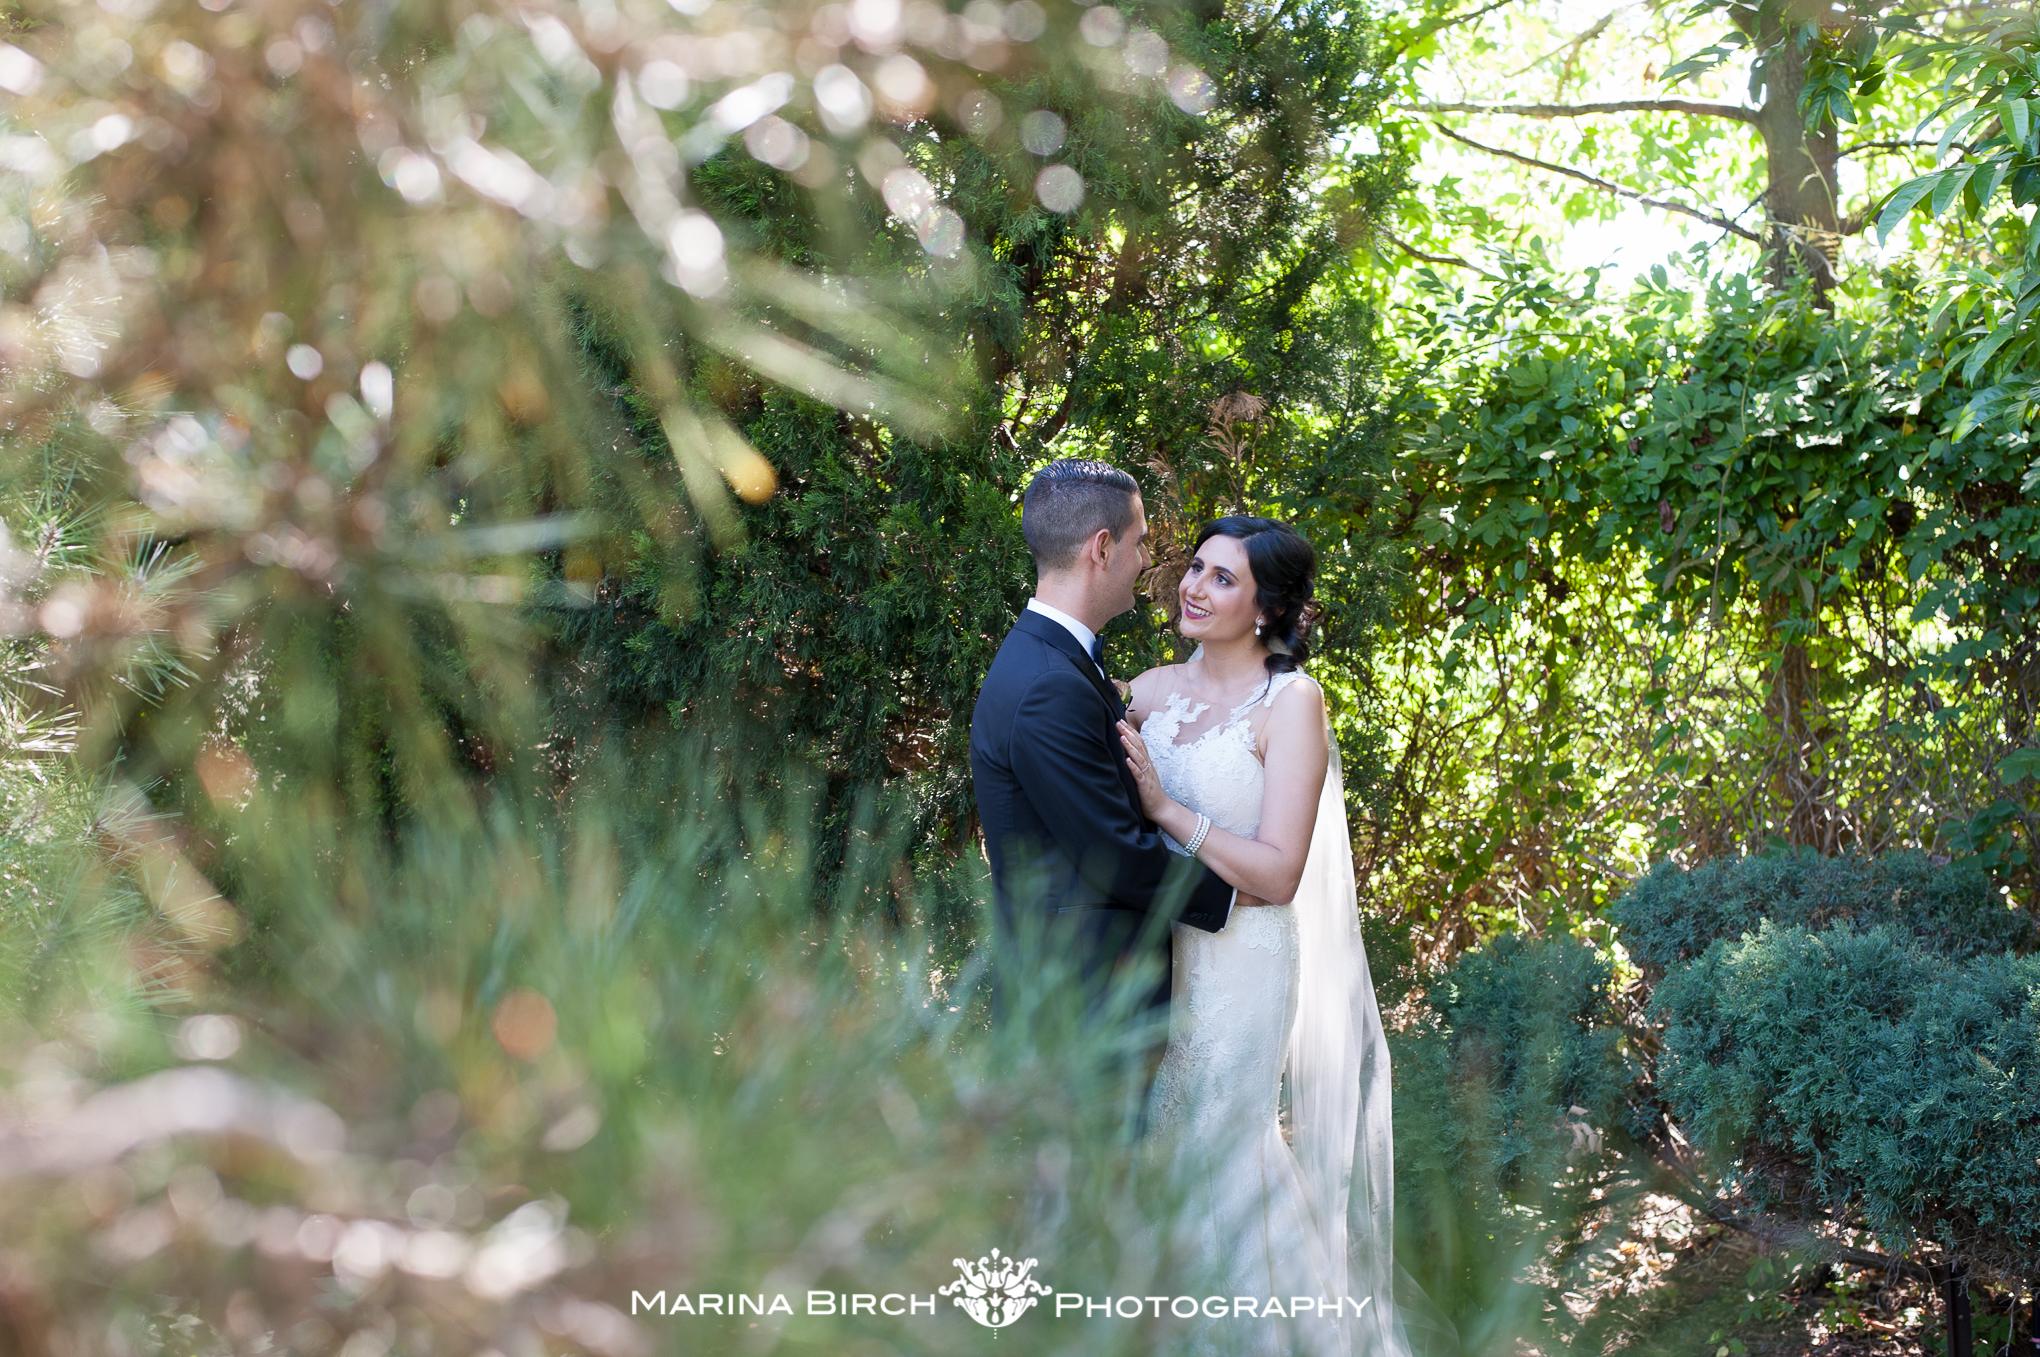 MBP.Lava wedding -21.jpg